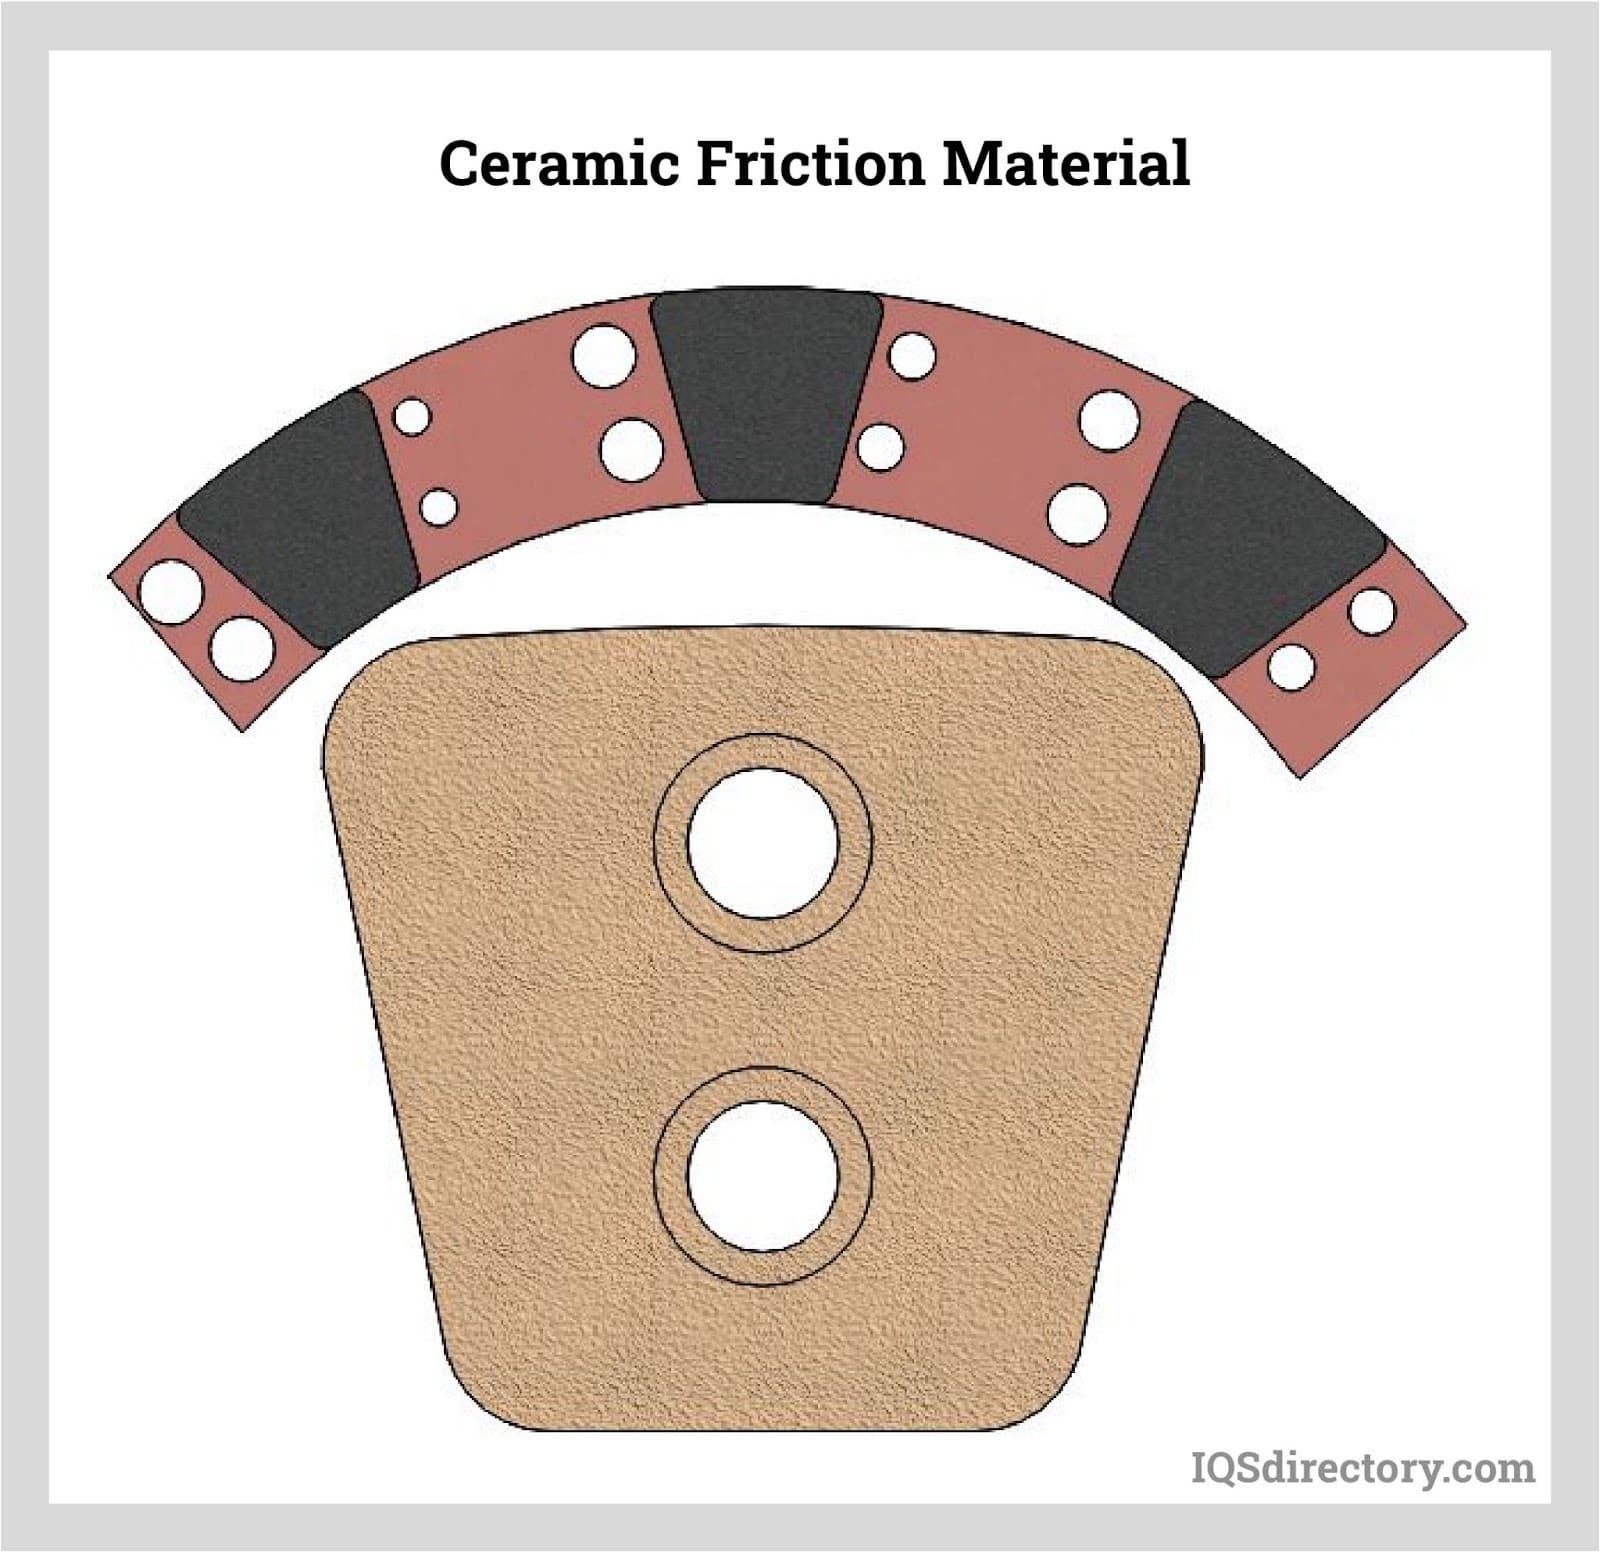 Ceramic Friction Material